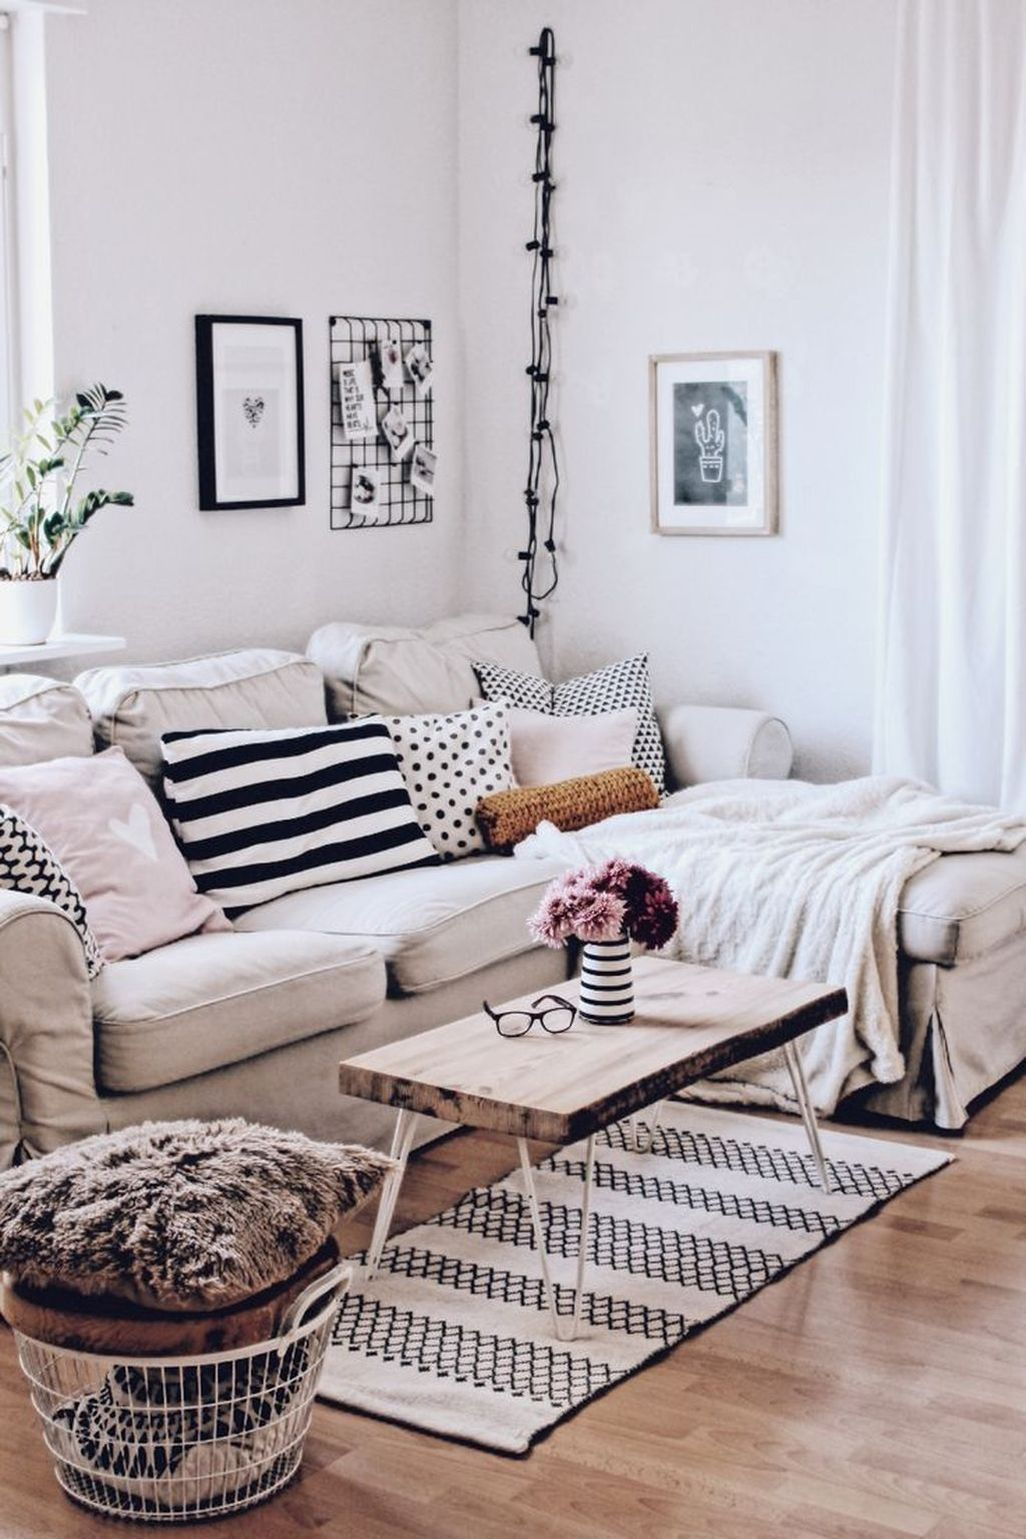 49 Astonishing Scandinavian Living Room To Rock This Year ...